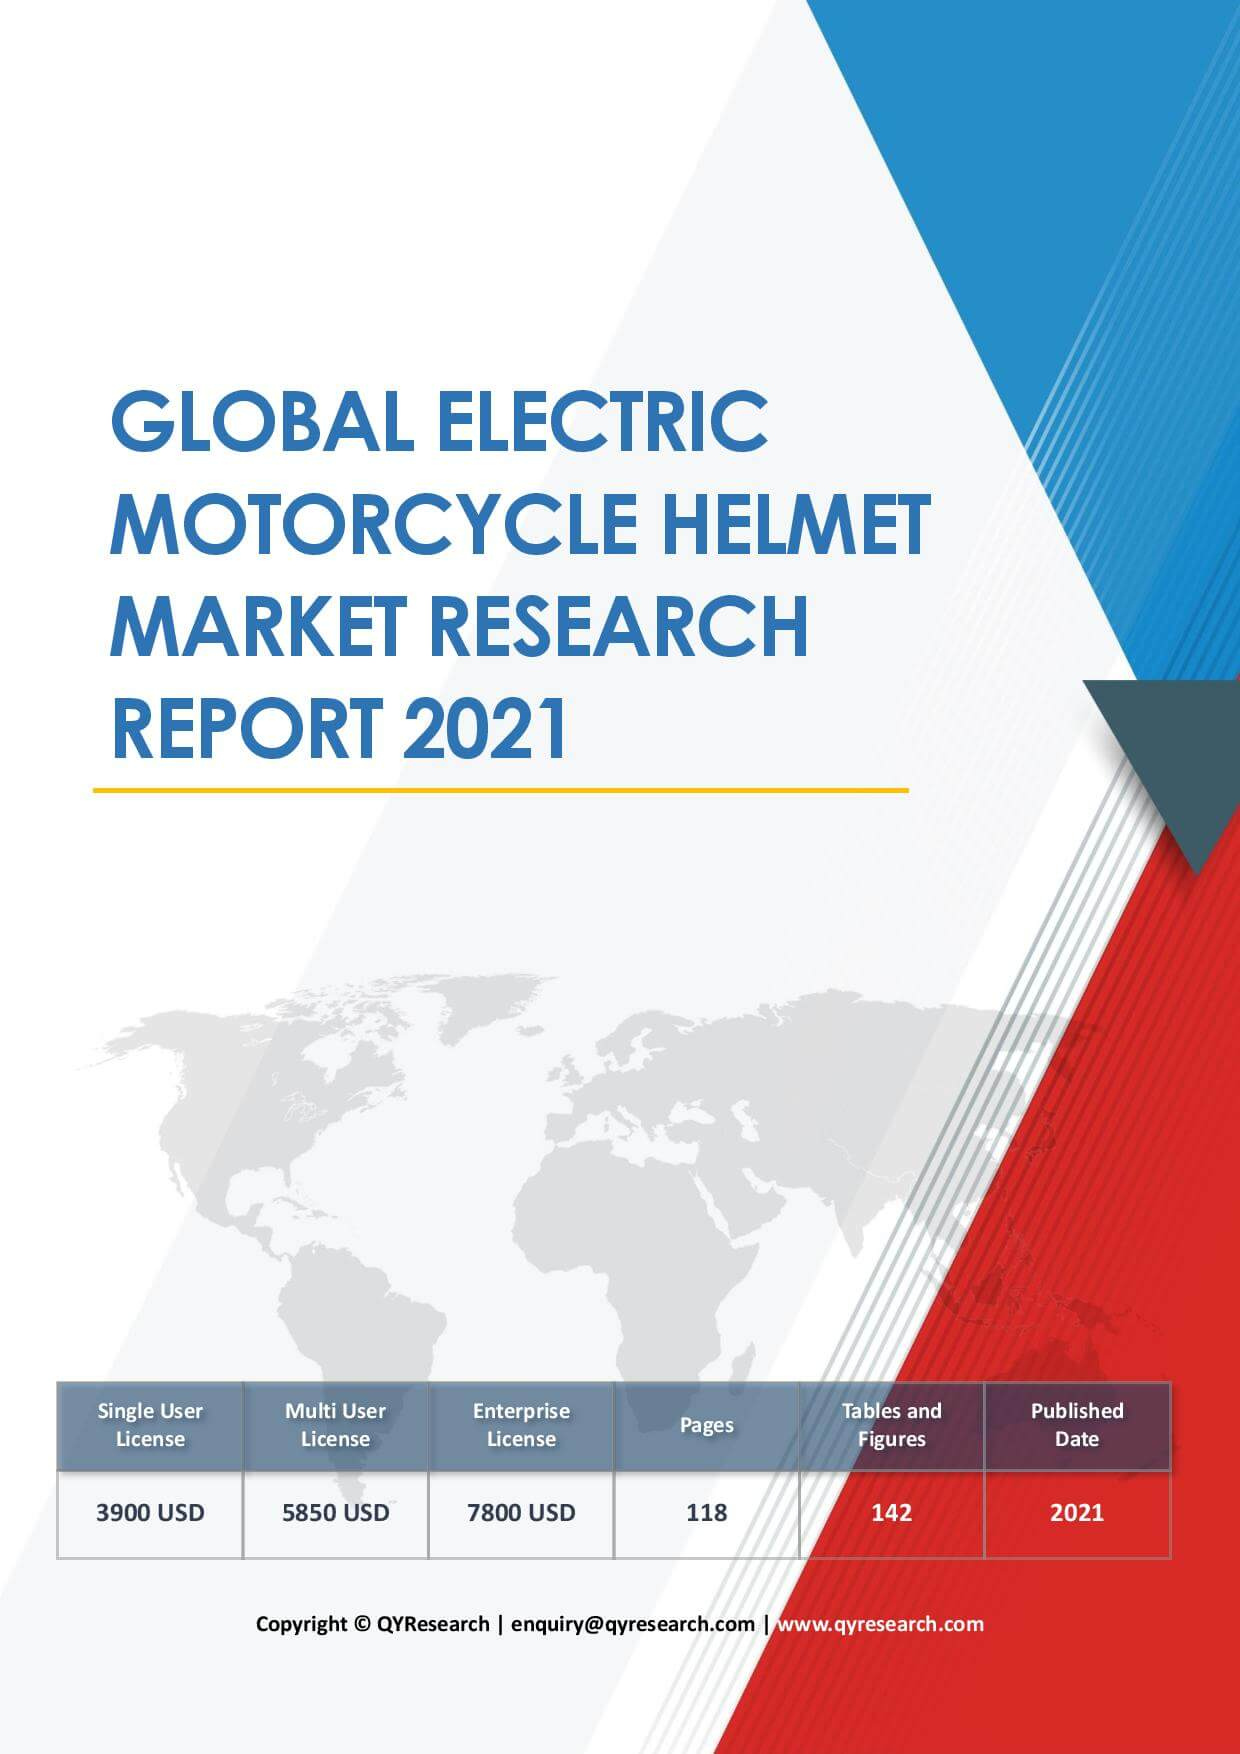 Global Electric Motorcycle Helmet Market Research Report 2021